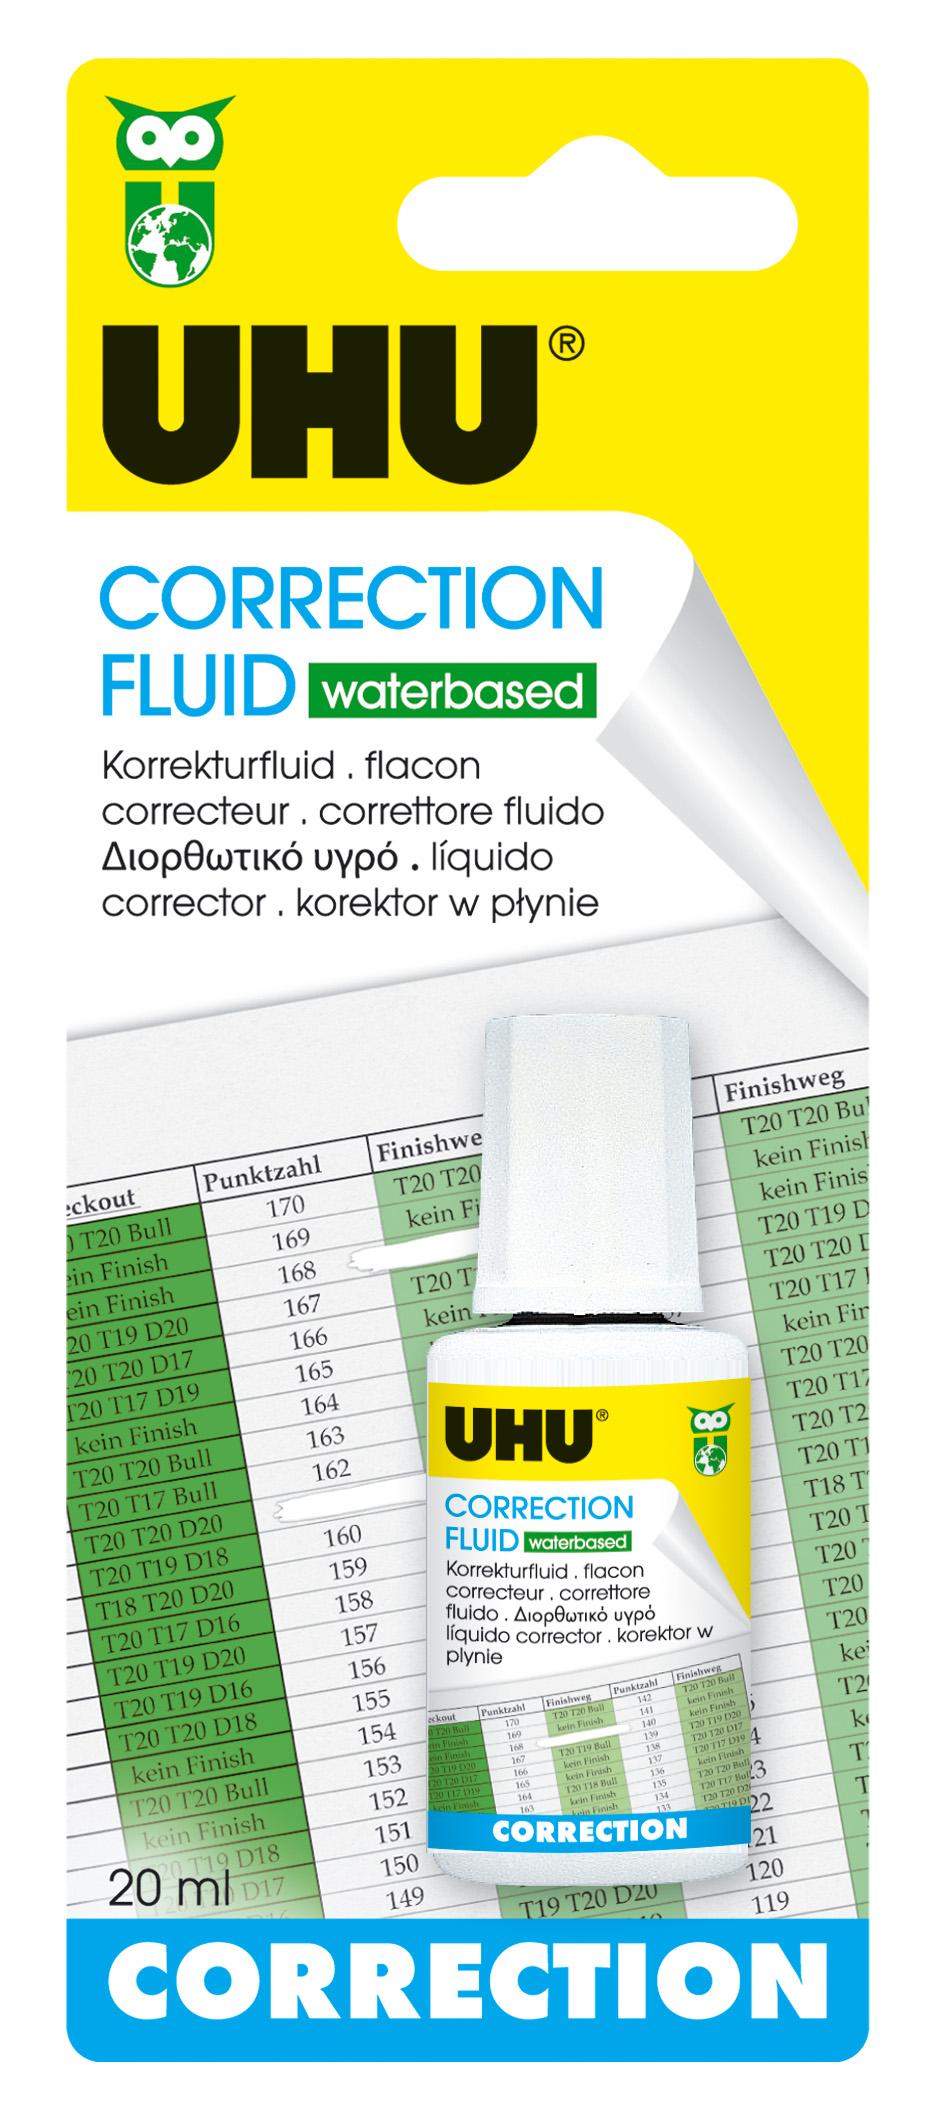 UHU Correction Fluid Korrektur-Fluid wasserbasiert, Infokarte 20ml